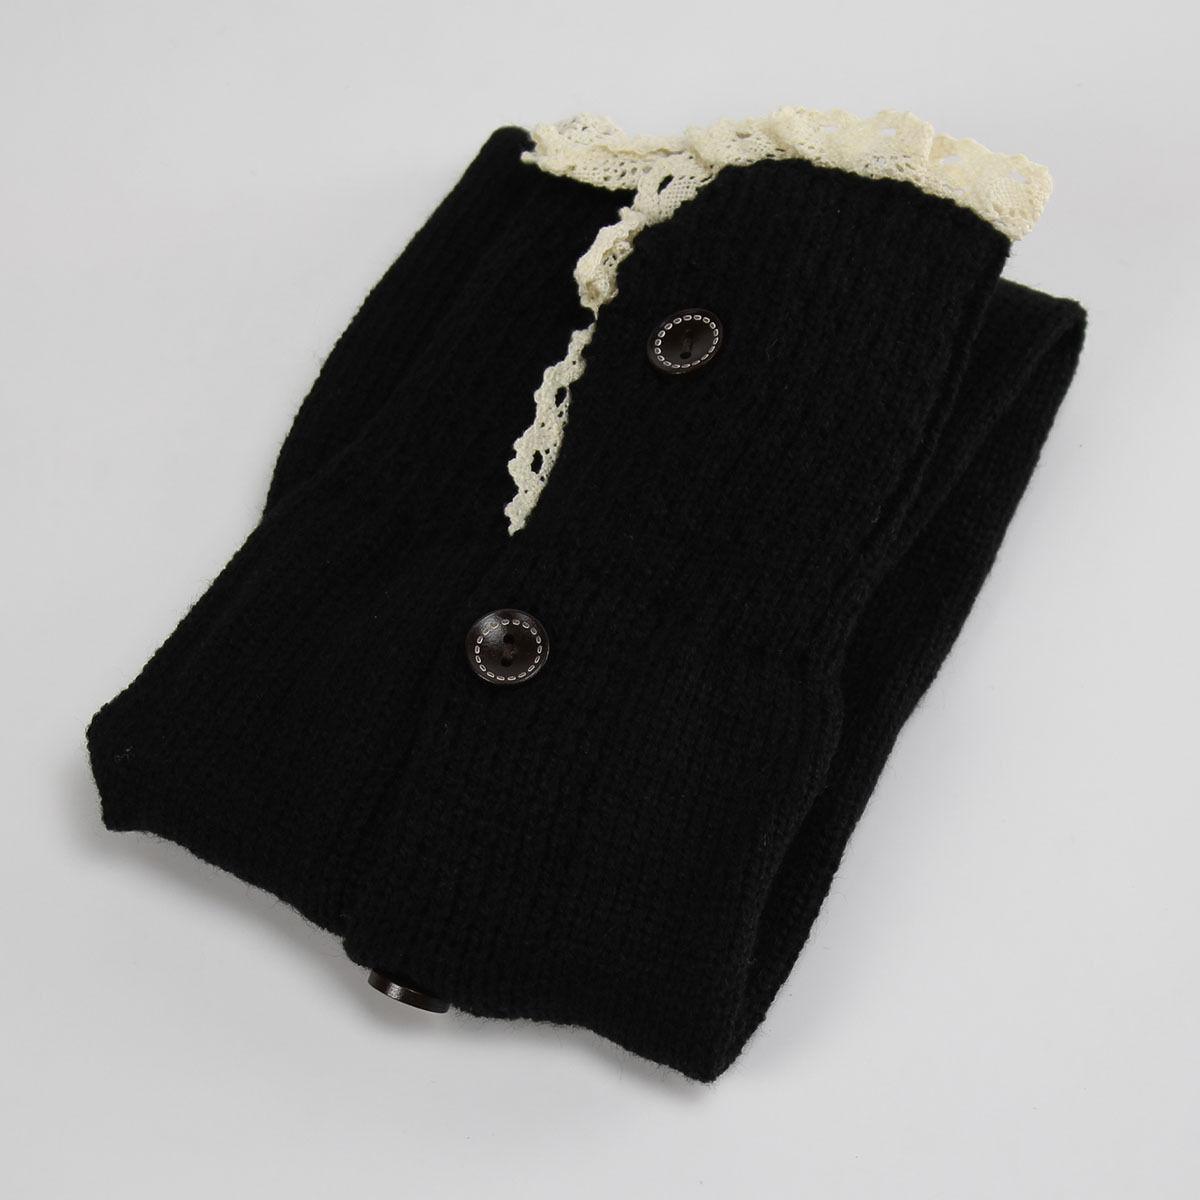 Women Knee High Knit Flat Lace Trim Button Down Crochet Leg Warmers Boot Socks